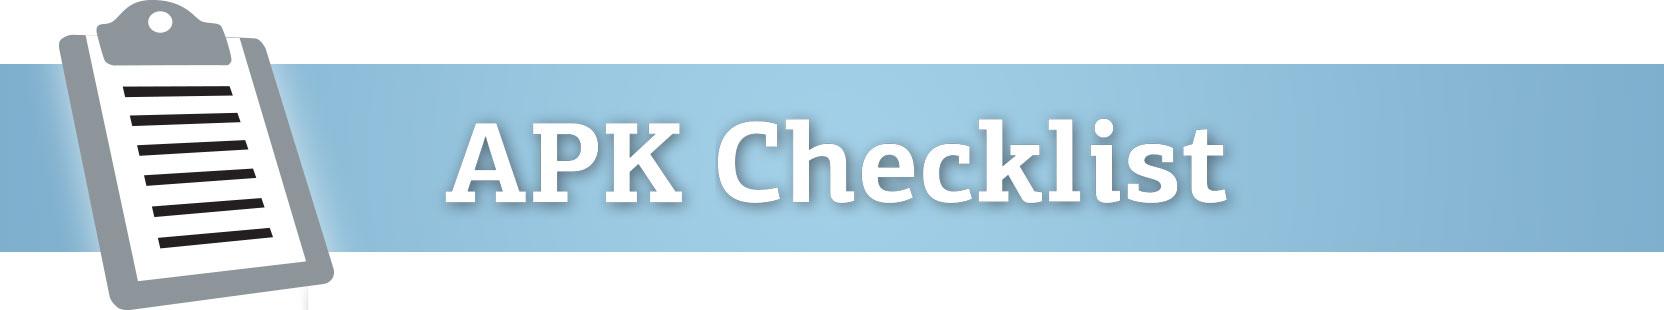 APK Checklist